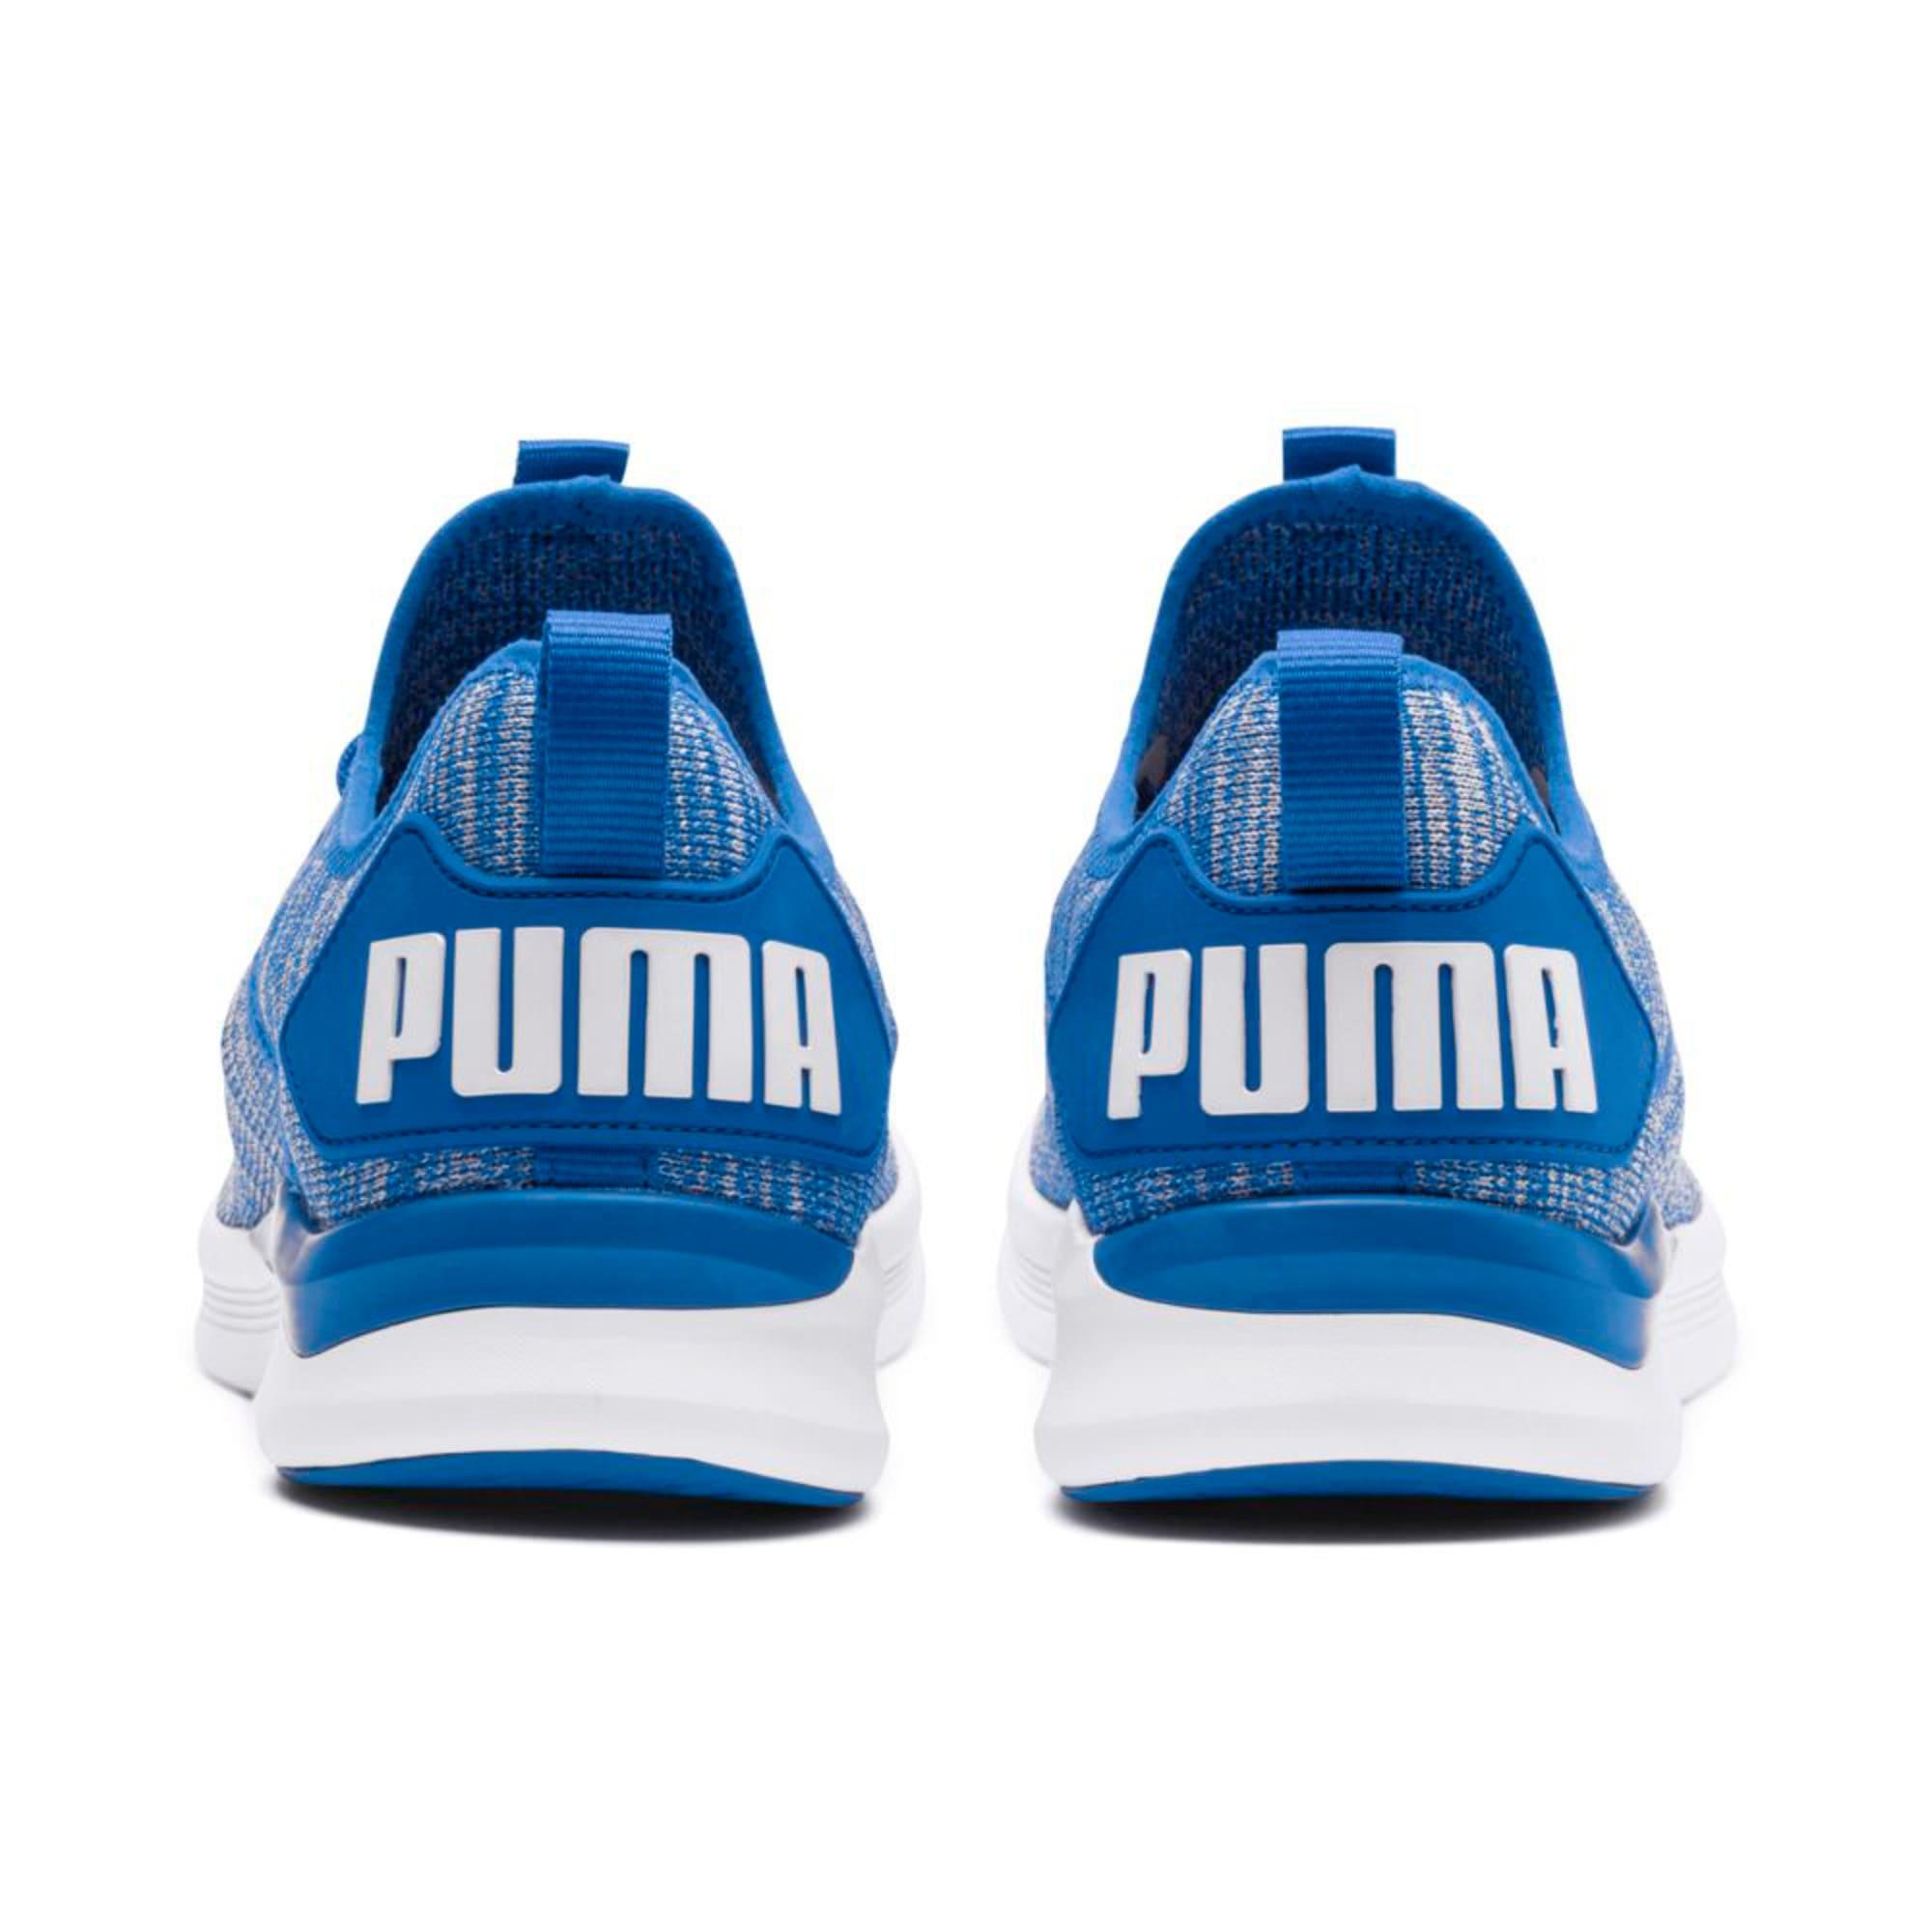 Thumbnail 4 of IGNITE Flash evoKNIT Men's Training Shoes, Strong Blue-White, medium-IND